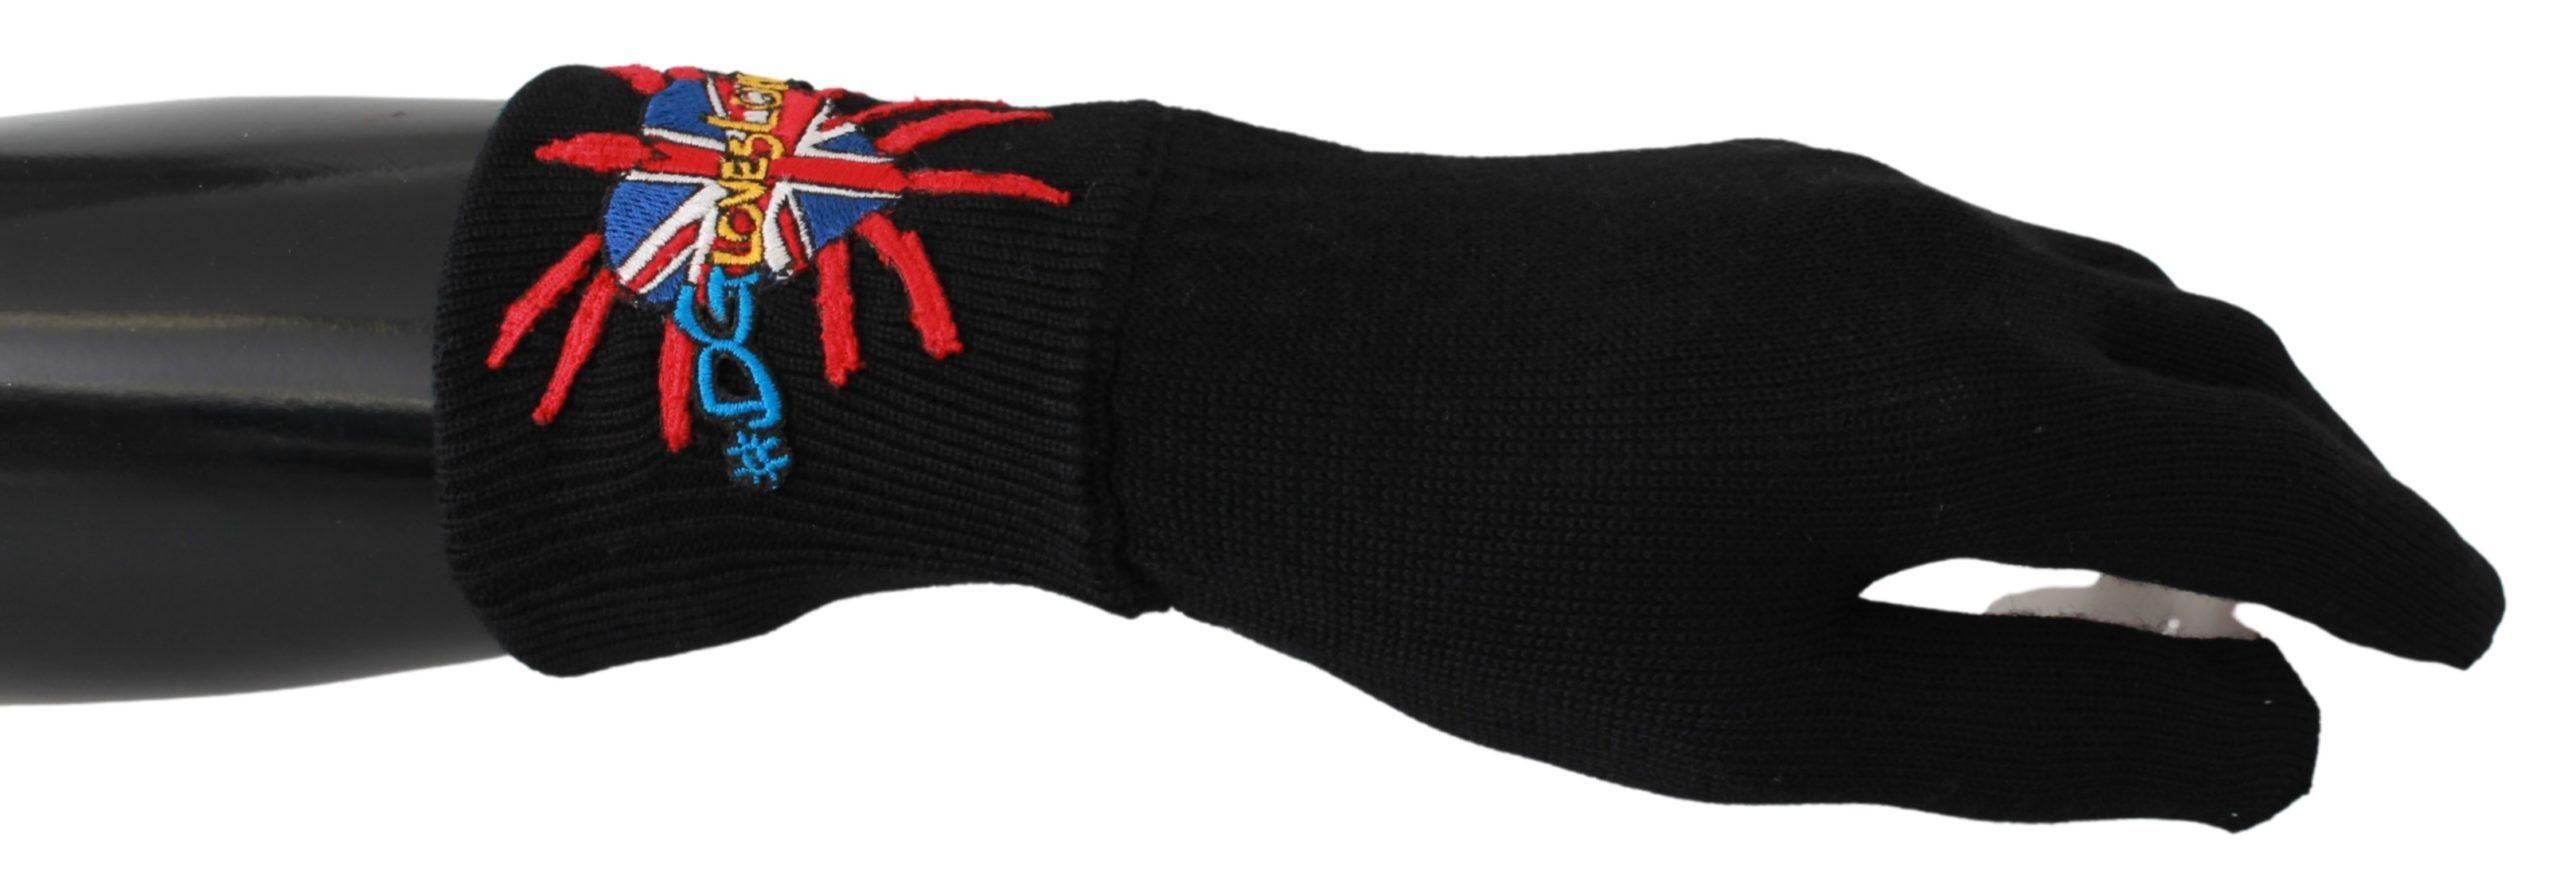 Dolce & Gabbana Men's Embroidered Wool Gloves Black 293990360551